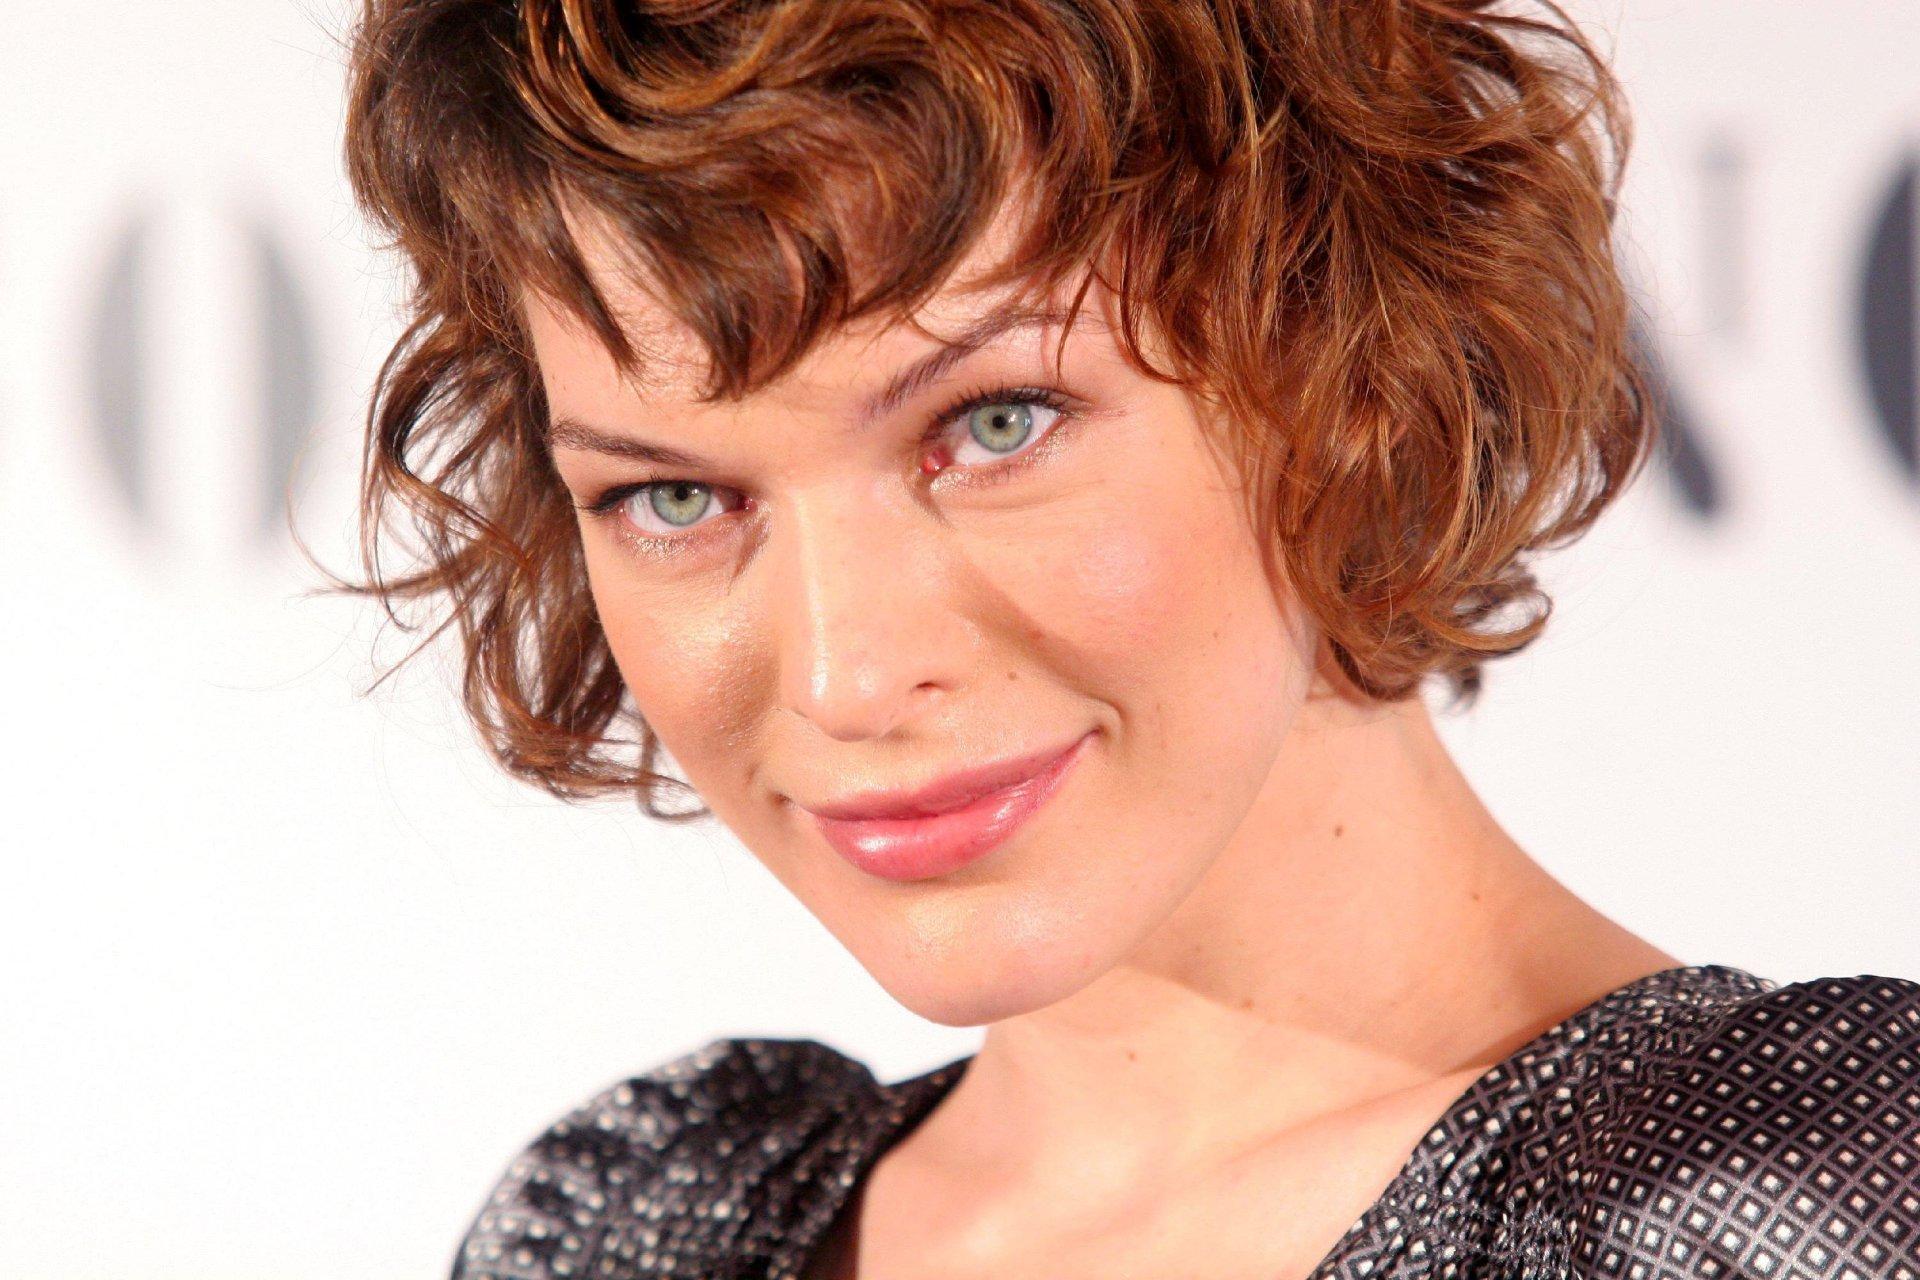 Milla Jovovich Full HD Wallpaper and Background Image ... милла йовович